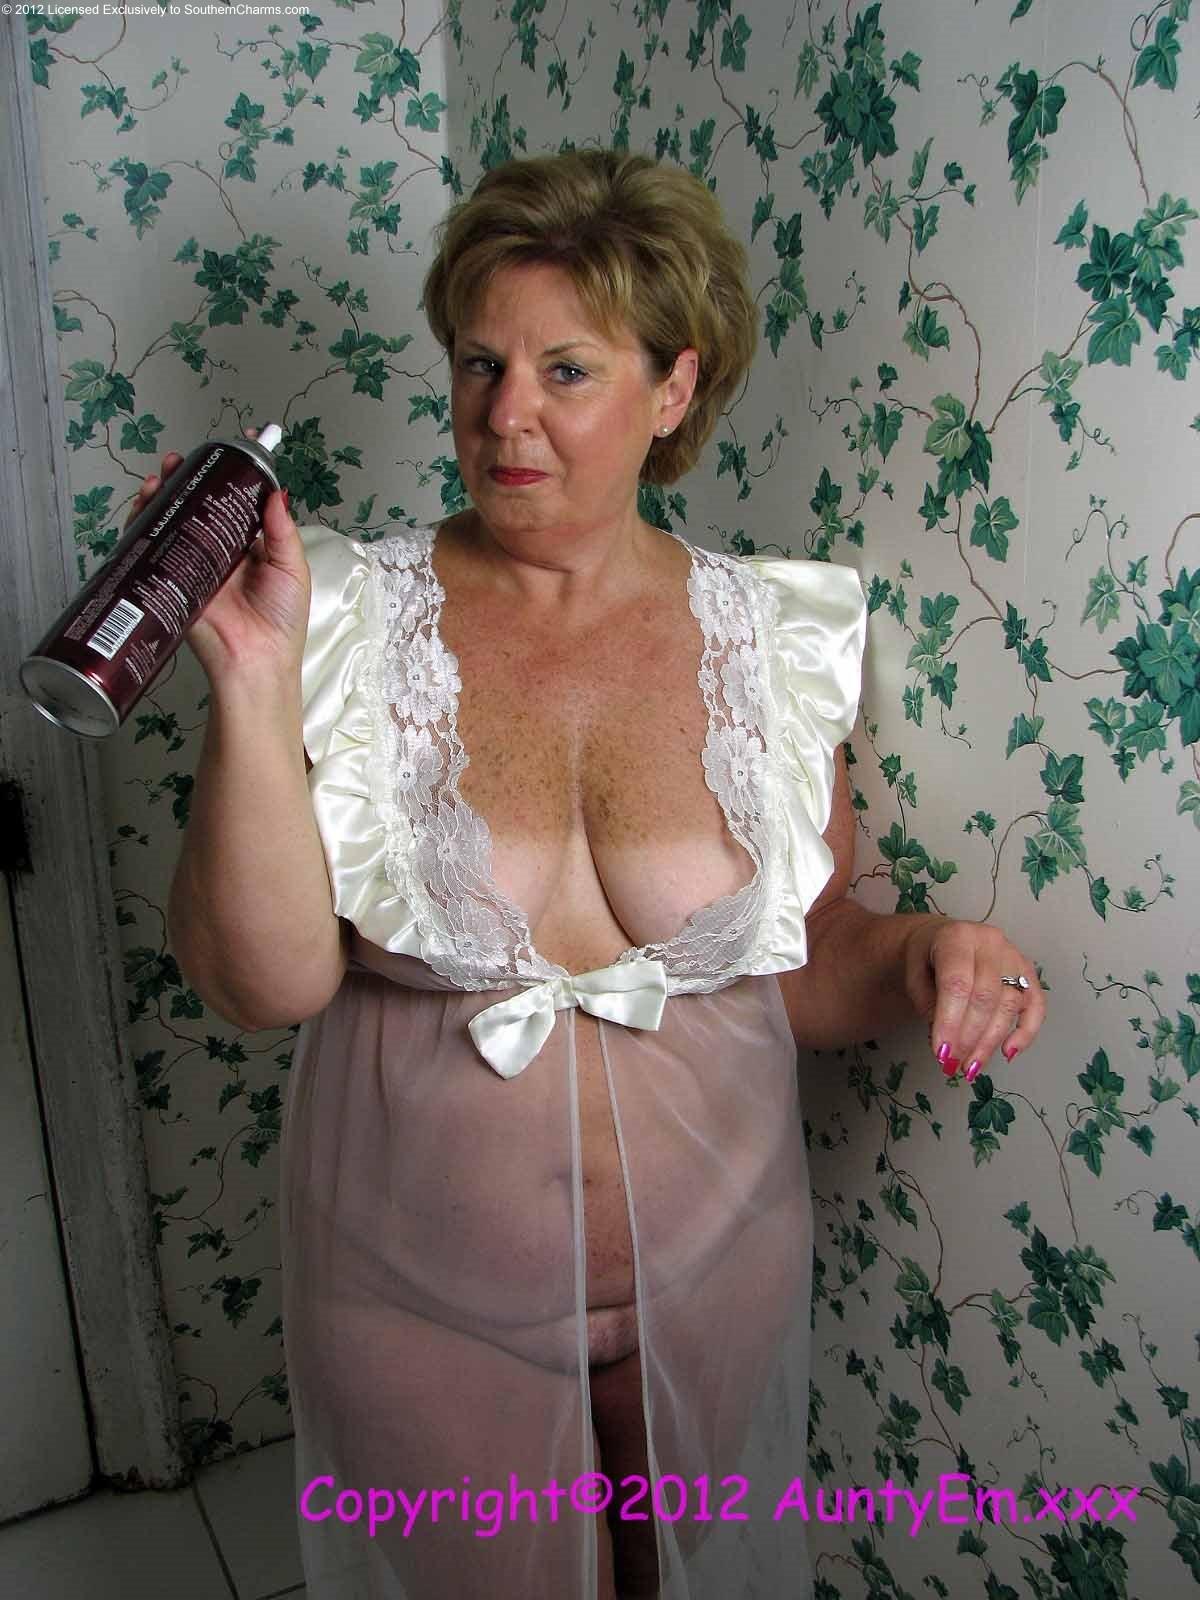 older women archive . blogspot . com: Big Arhive 2012